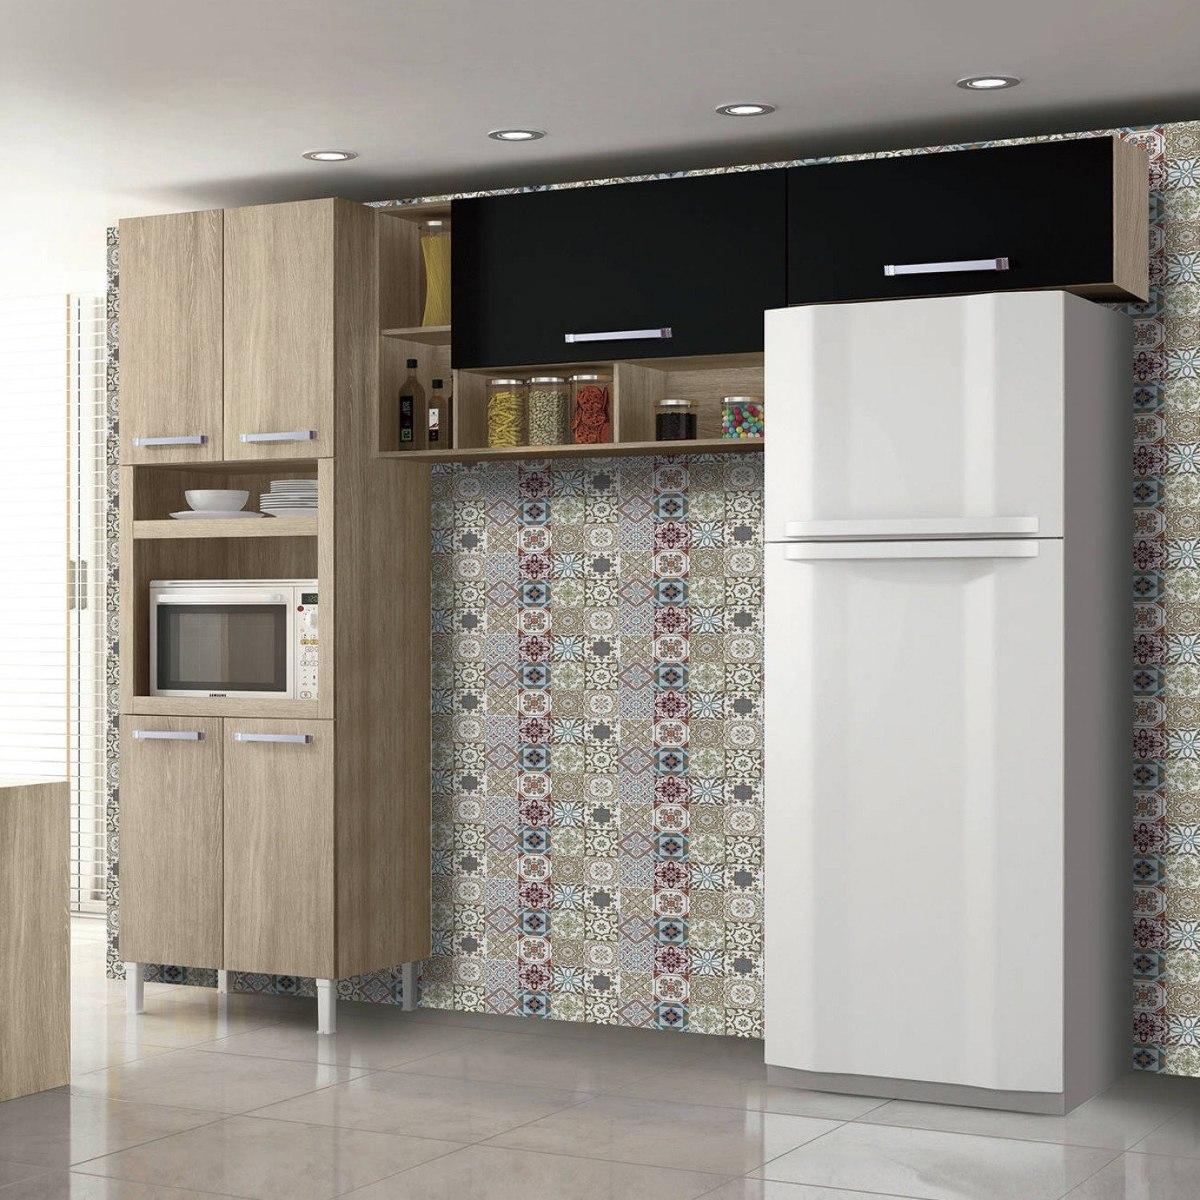 Cozinha Compacta 3 Pe As Com Nichos Sophia Master Eewt R 691 10